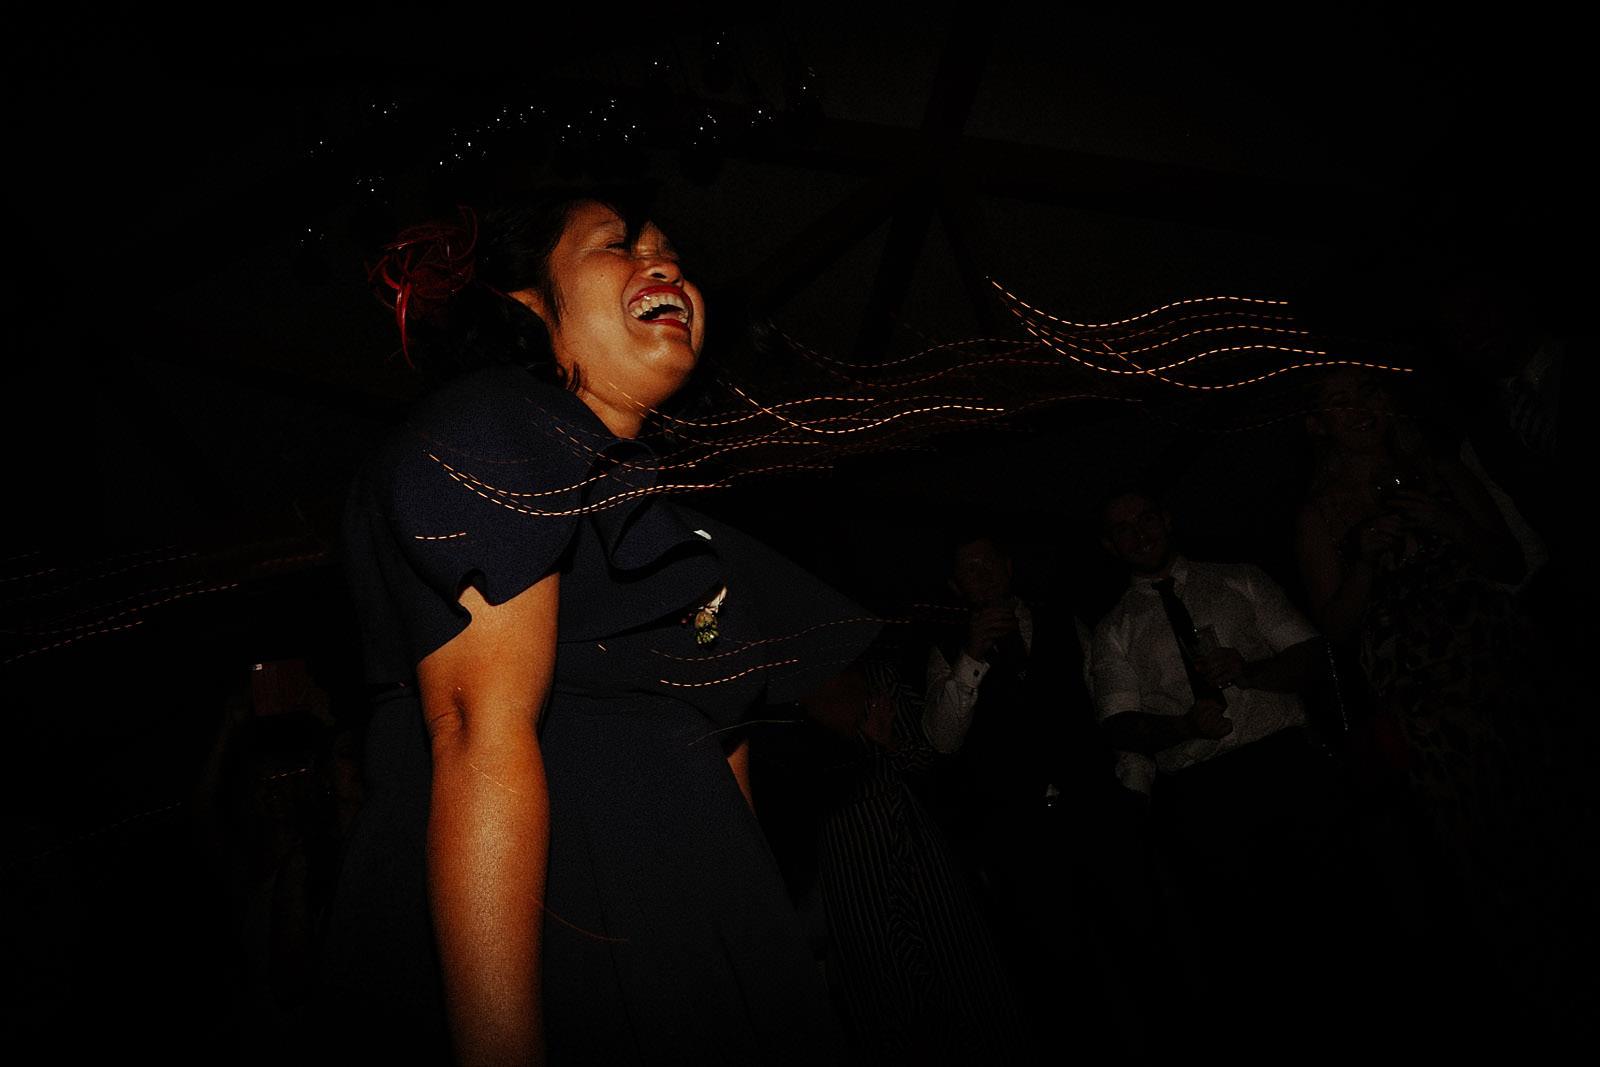 mother of the groom crazy dancing